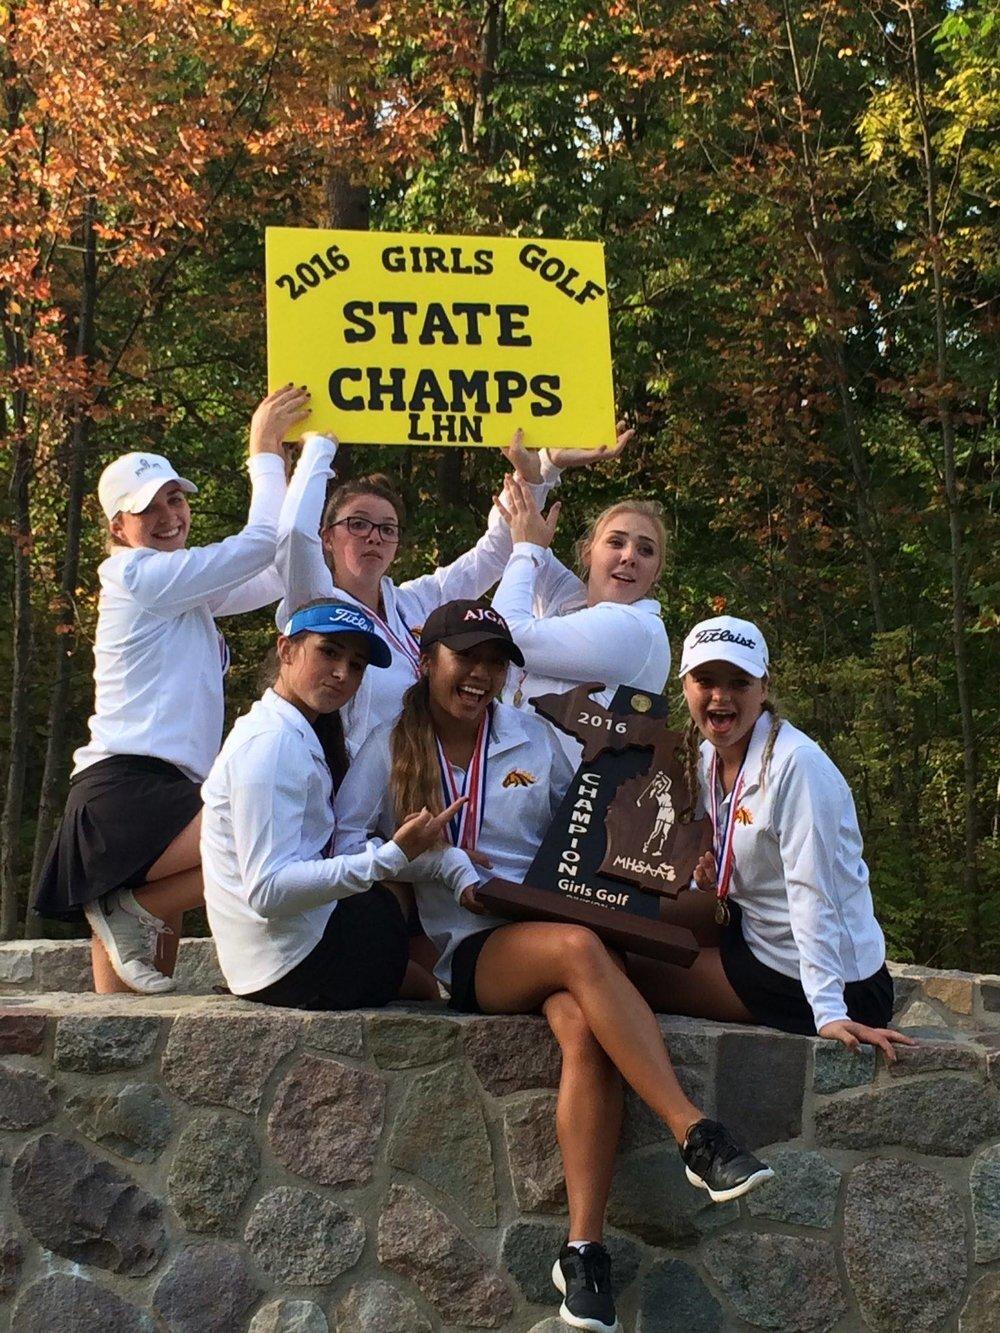 Lutheran_North_Macomb_Michigan_Golf_Girls_Champions_Coach_Laurie_Gill+(3).jpg